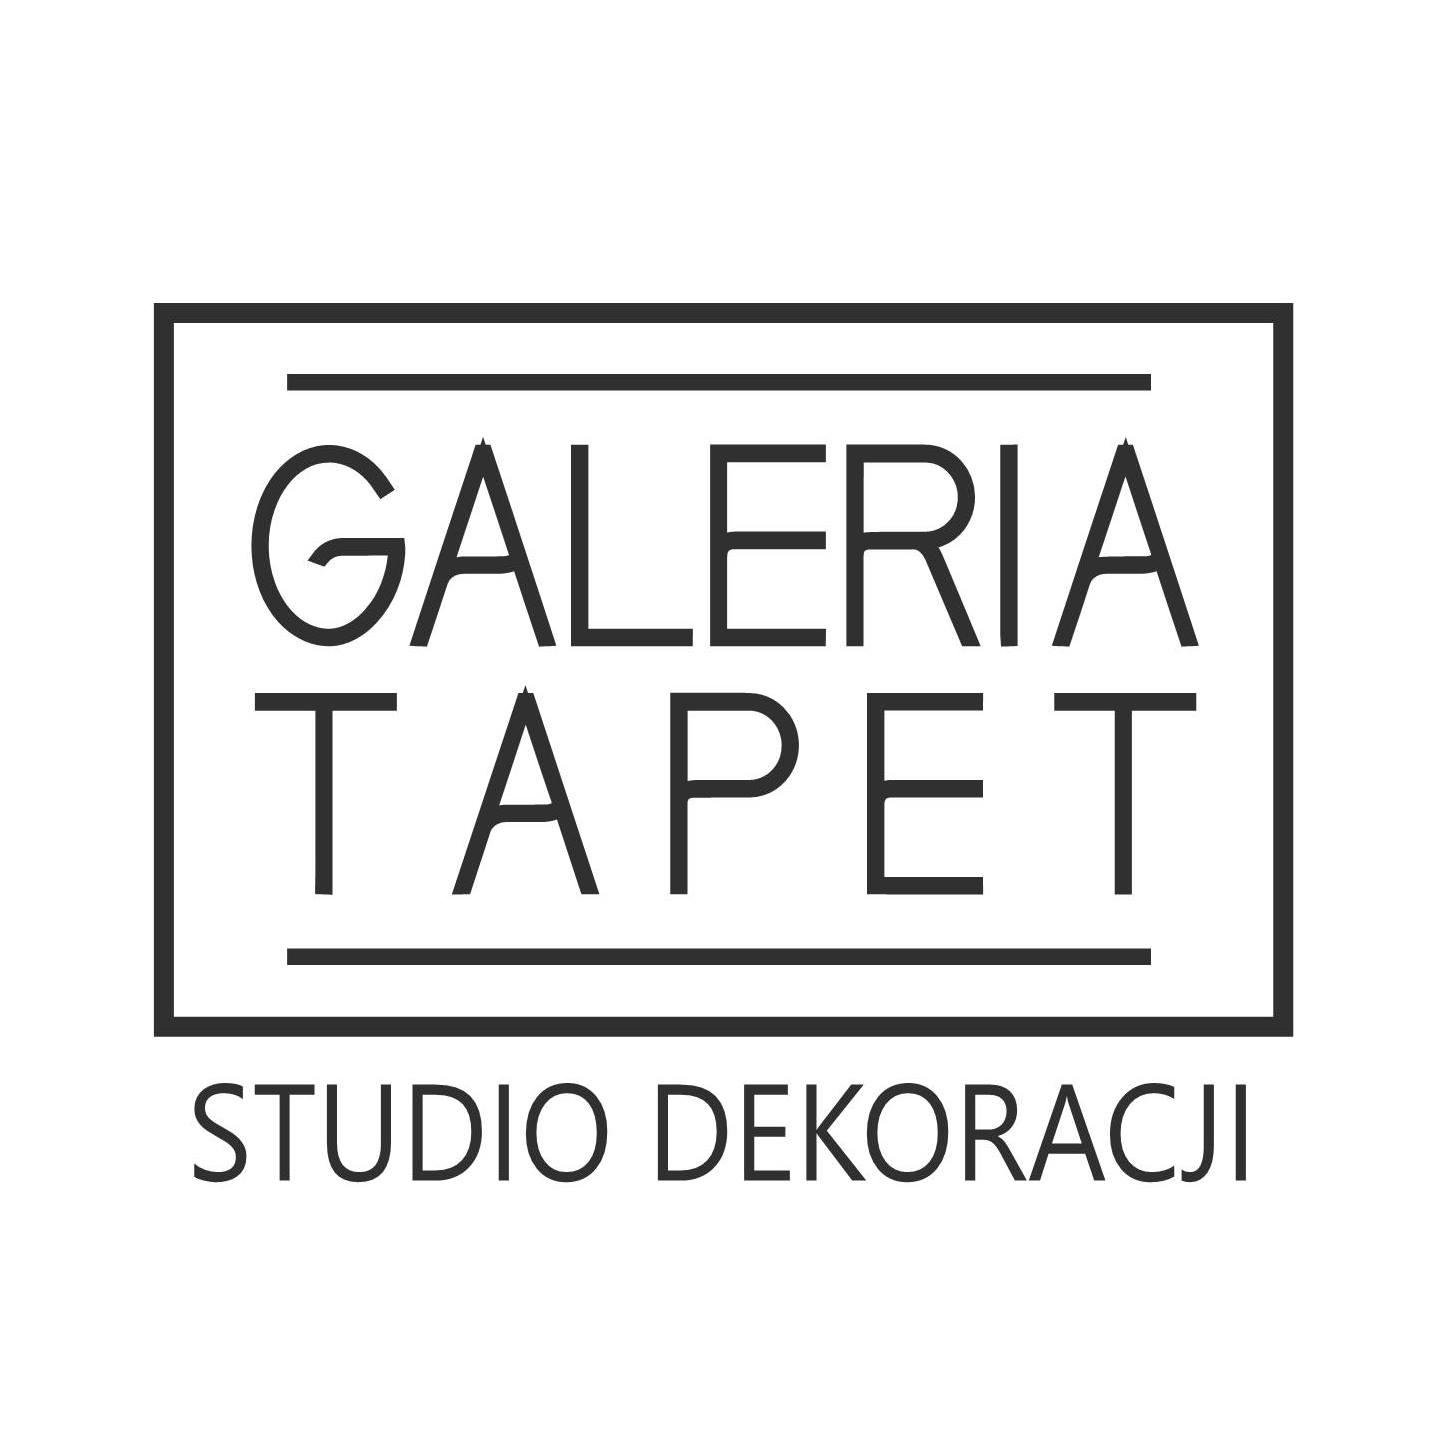 Galeria Tapet Studio Dekoracji